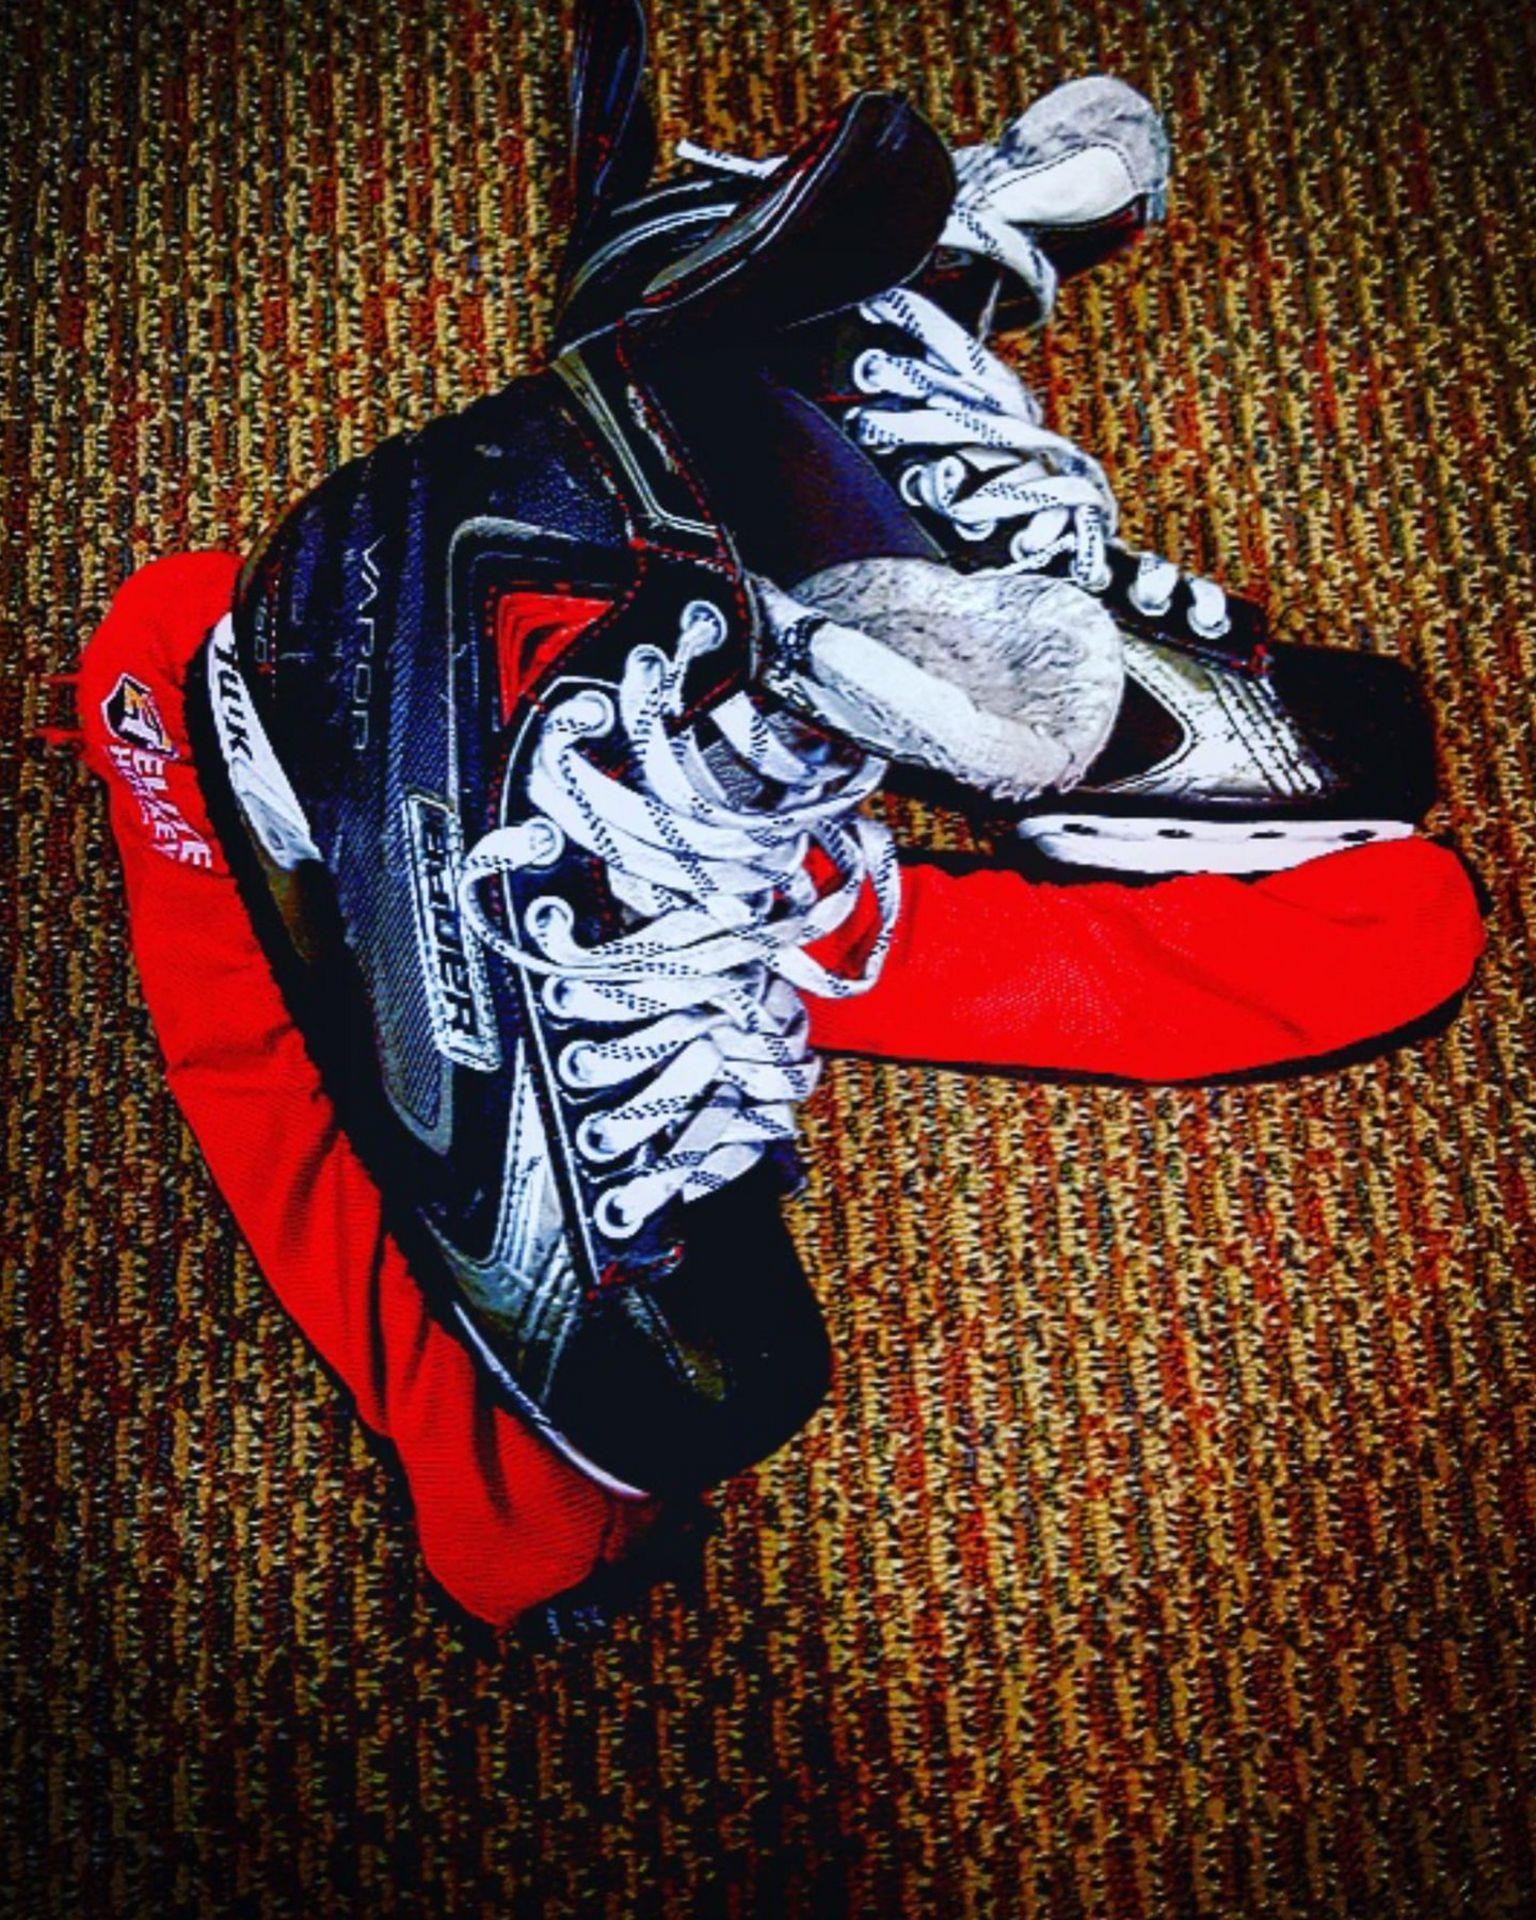 A pair of ice skates